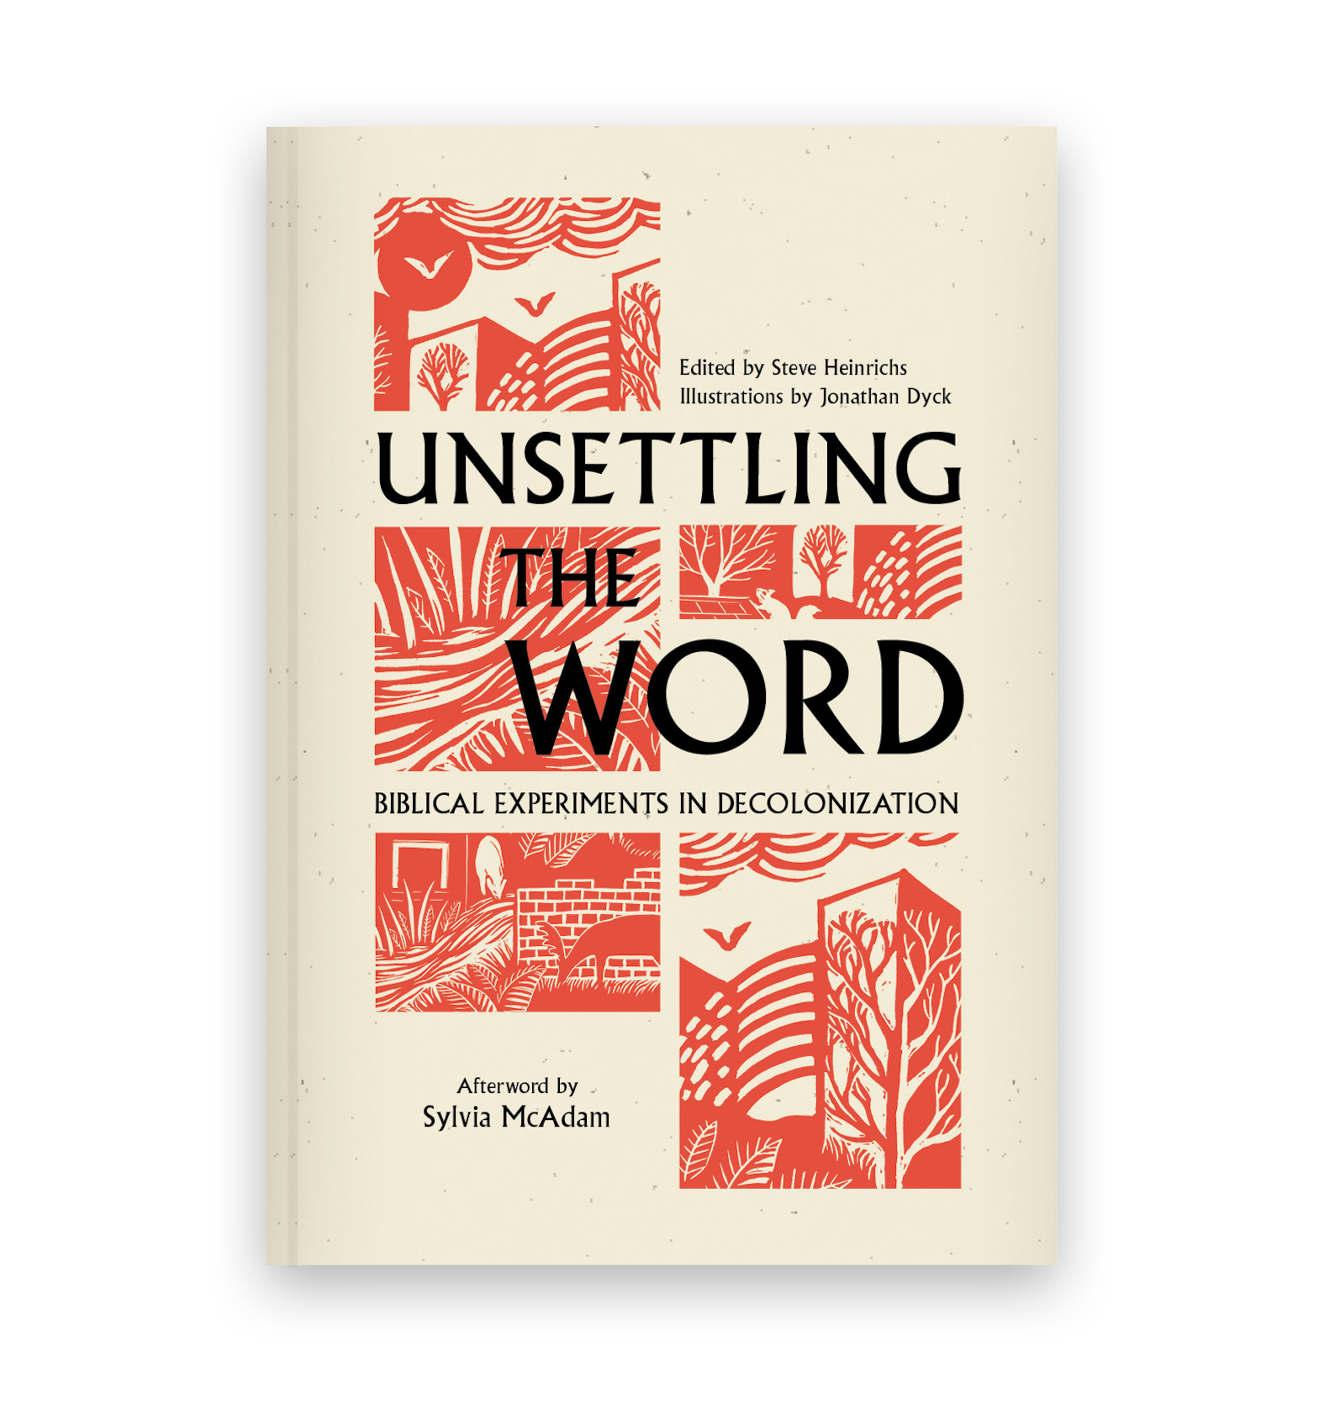 Unsettling-the-Word-Cover_1340_c.jpg